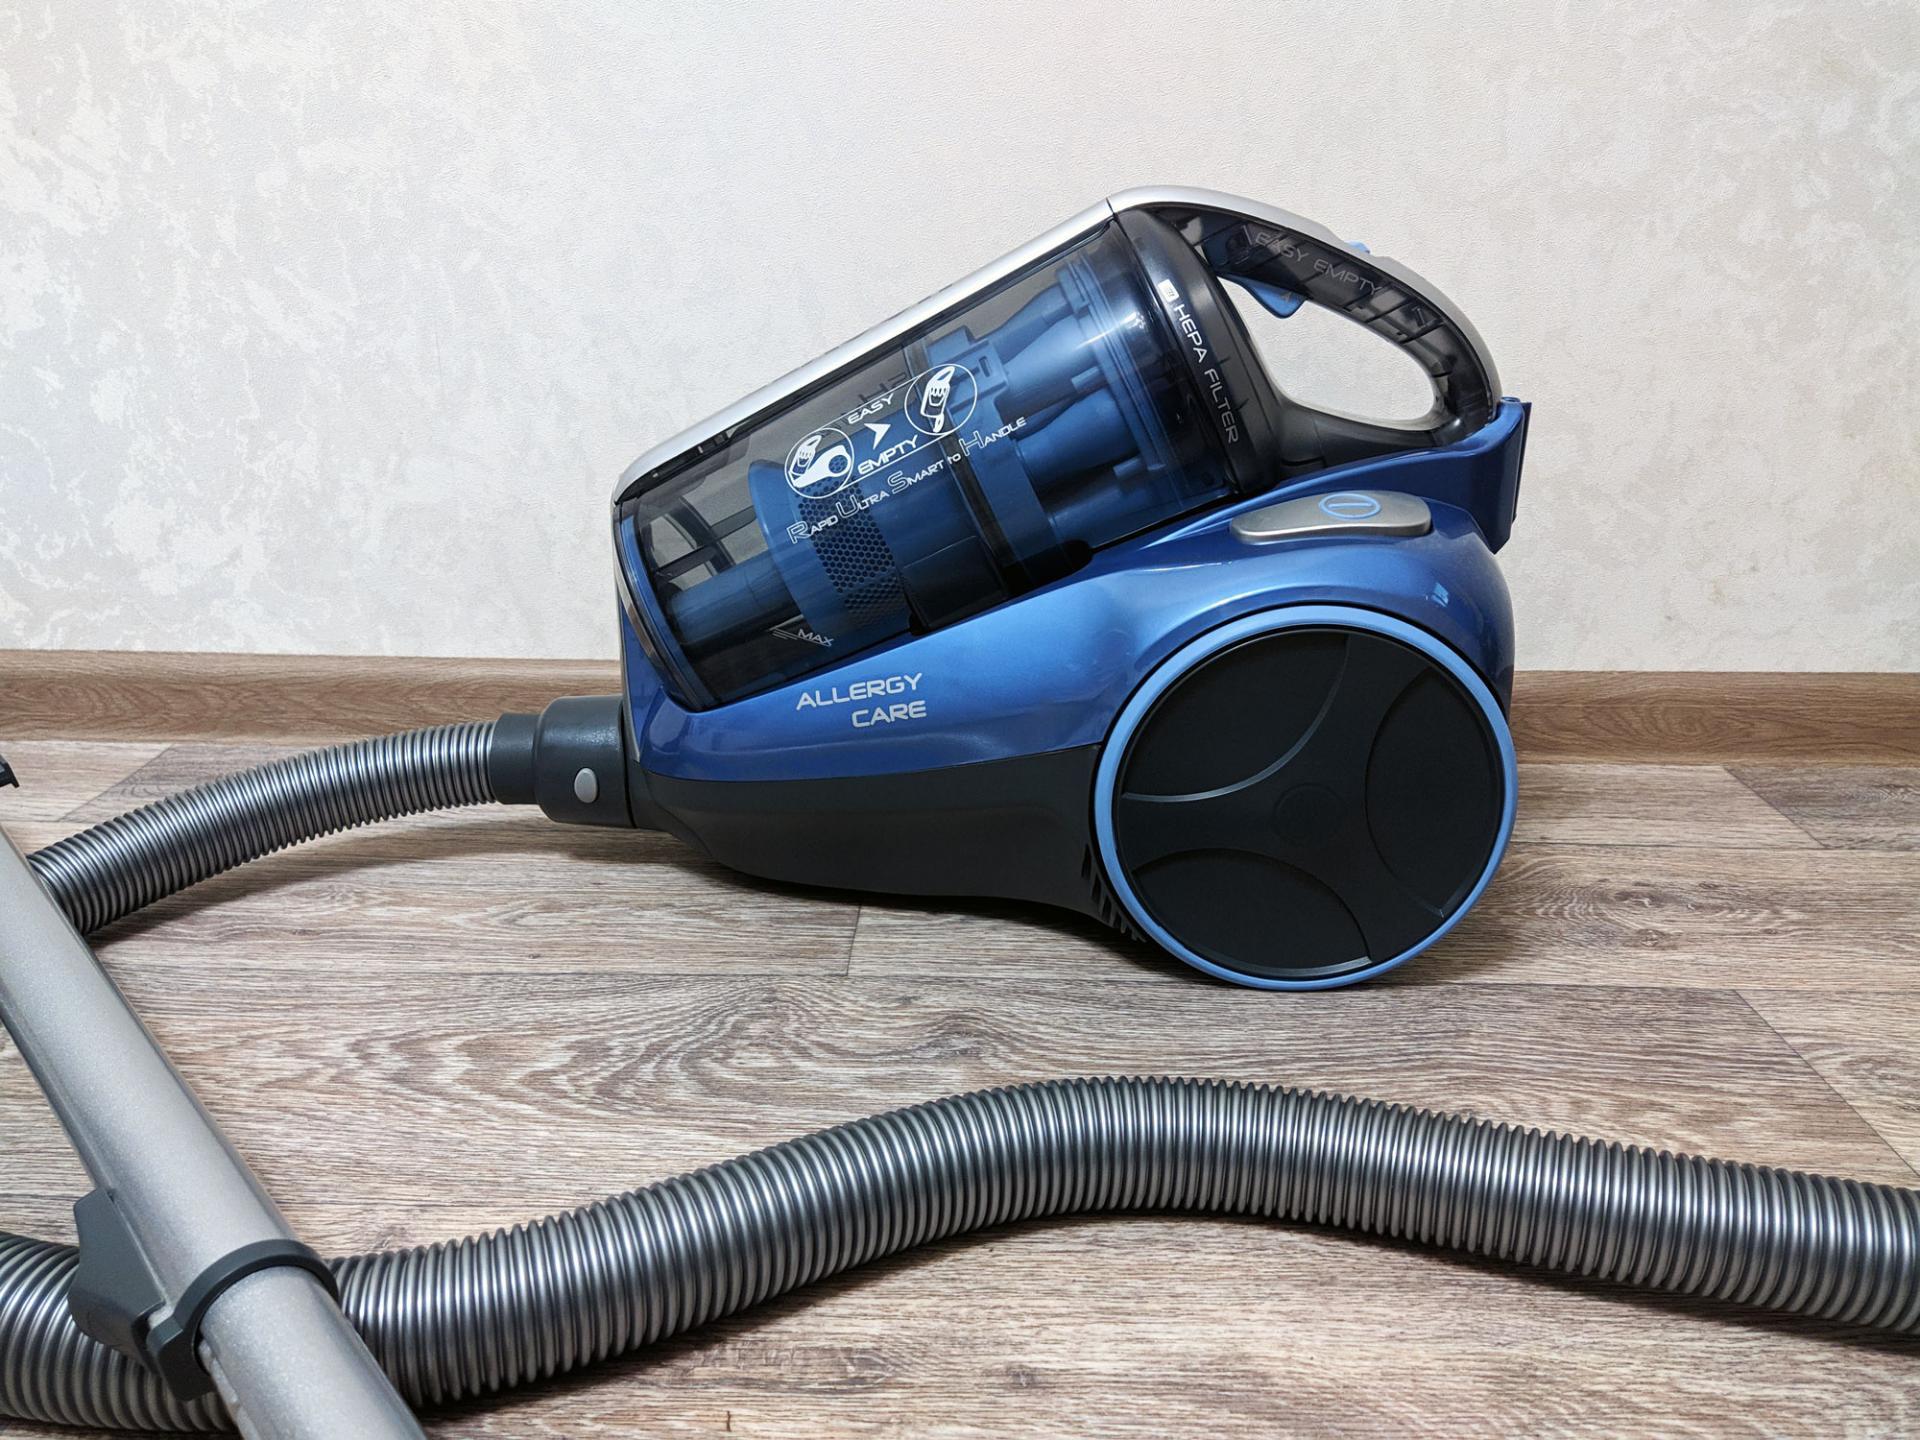 Тест-драйв пылесоса Hoover TRE1 420 019 RUSH EXTRA